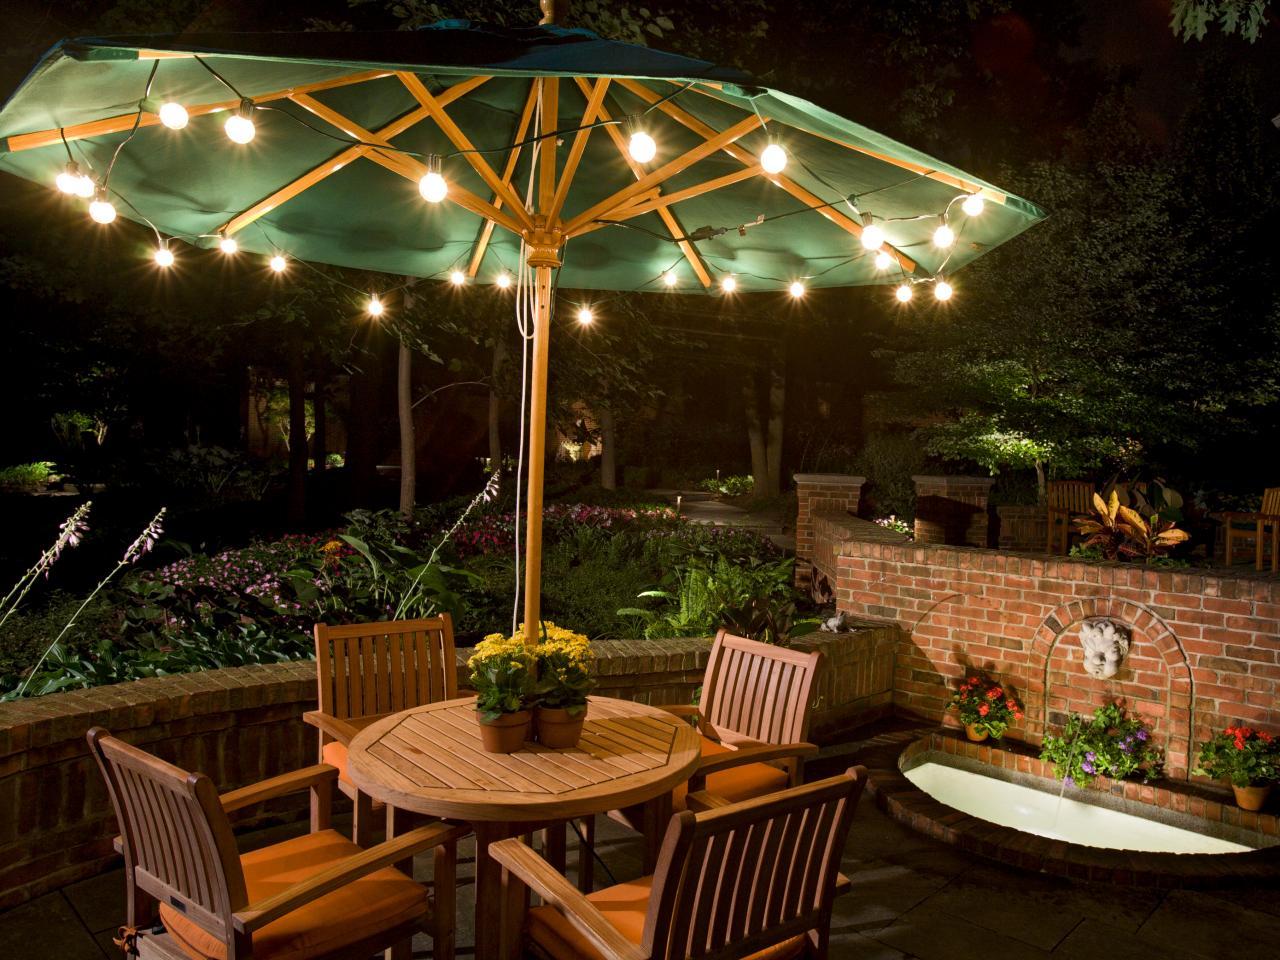 Outdoor porch lamp - Outdoor Porch Lamp 49